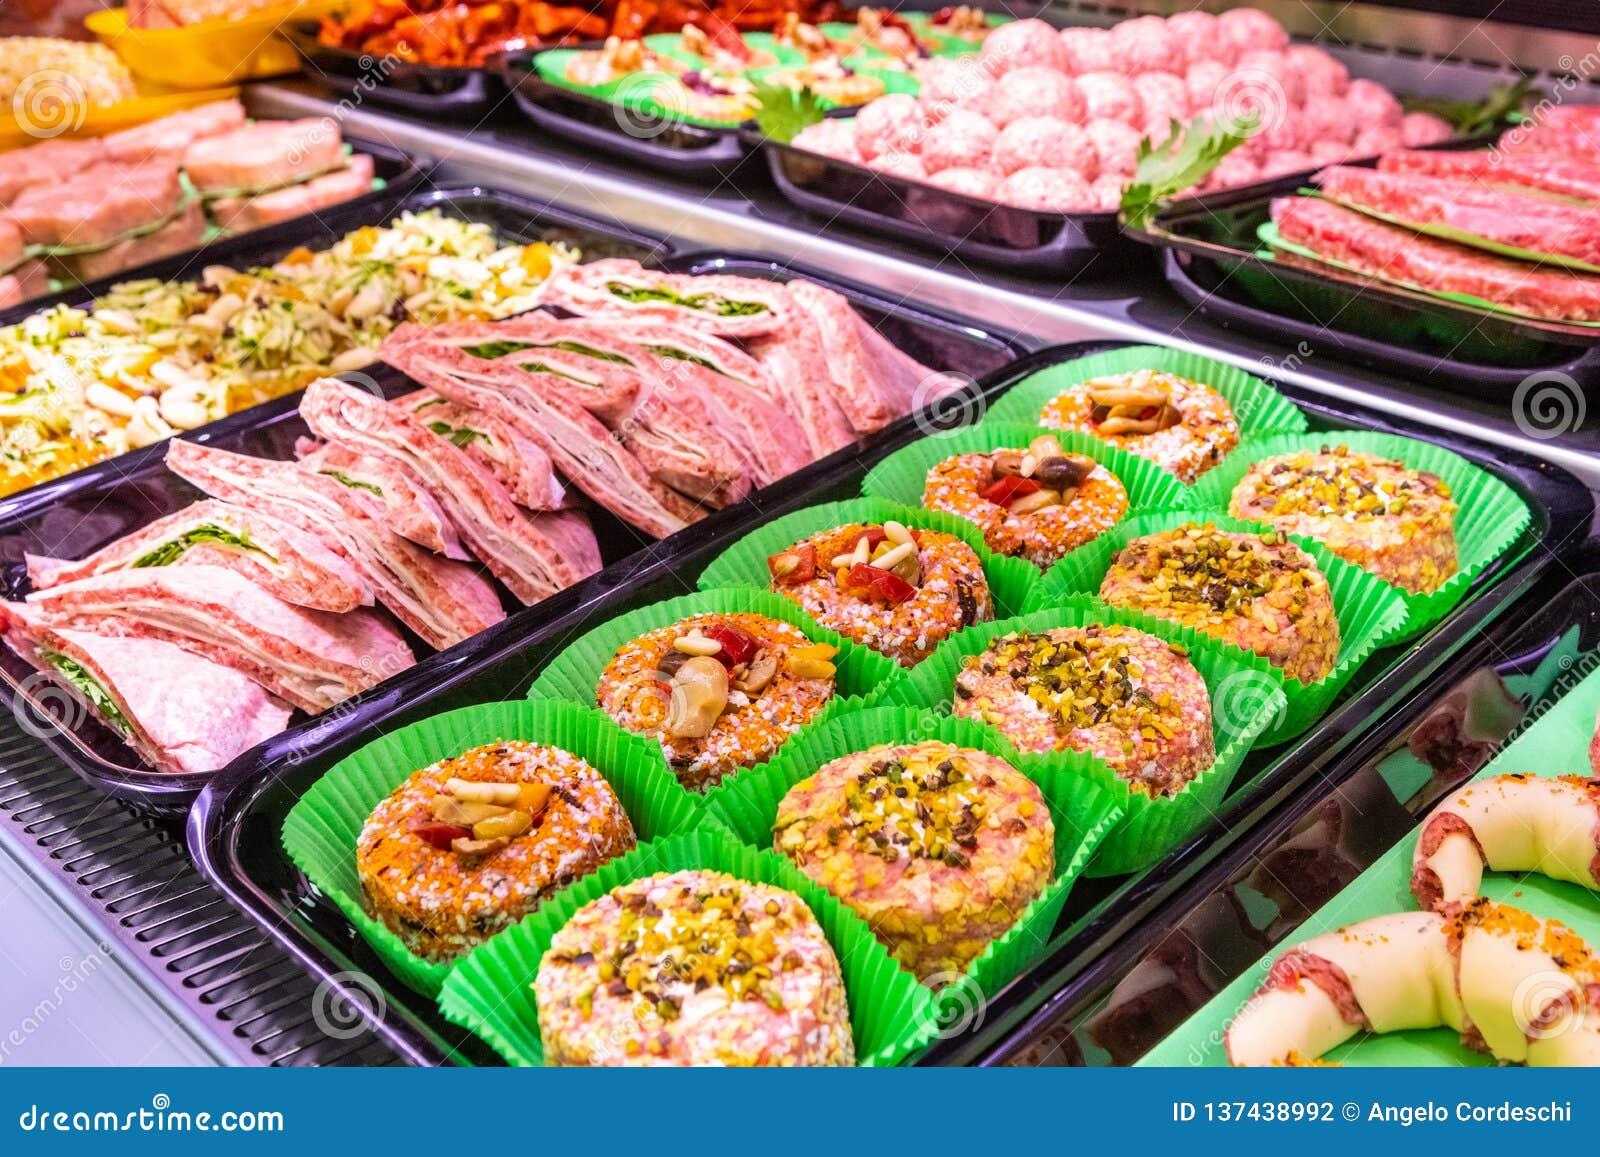 Отдел мяса, витрина с разнообразием мяса в различных отрезках